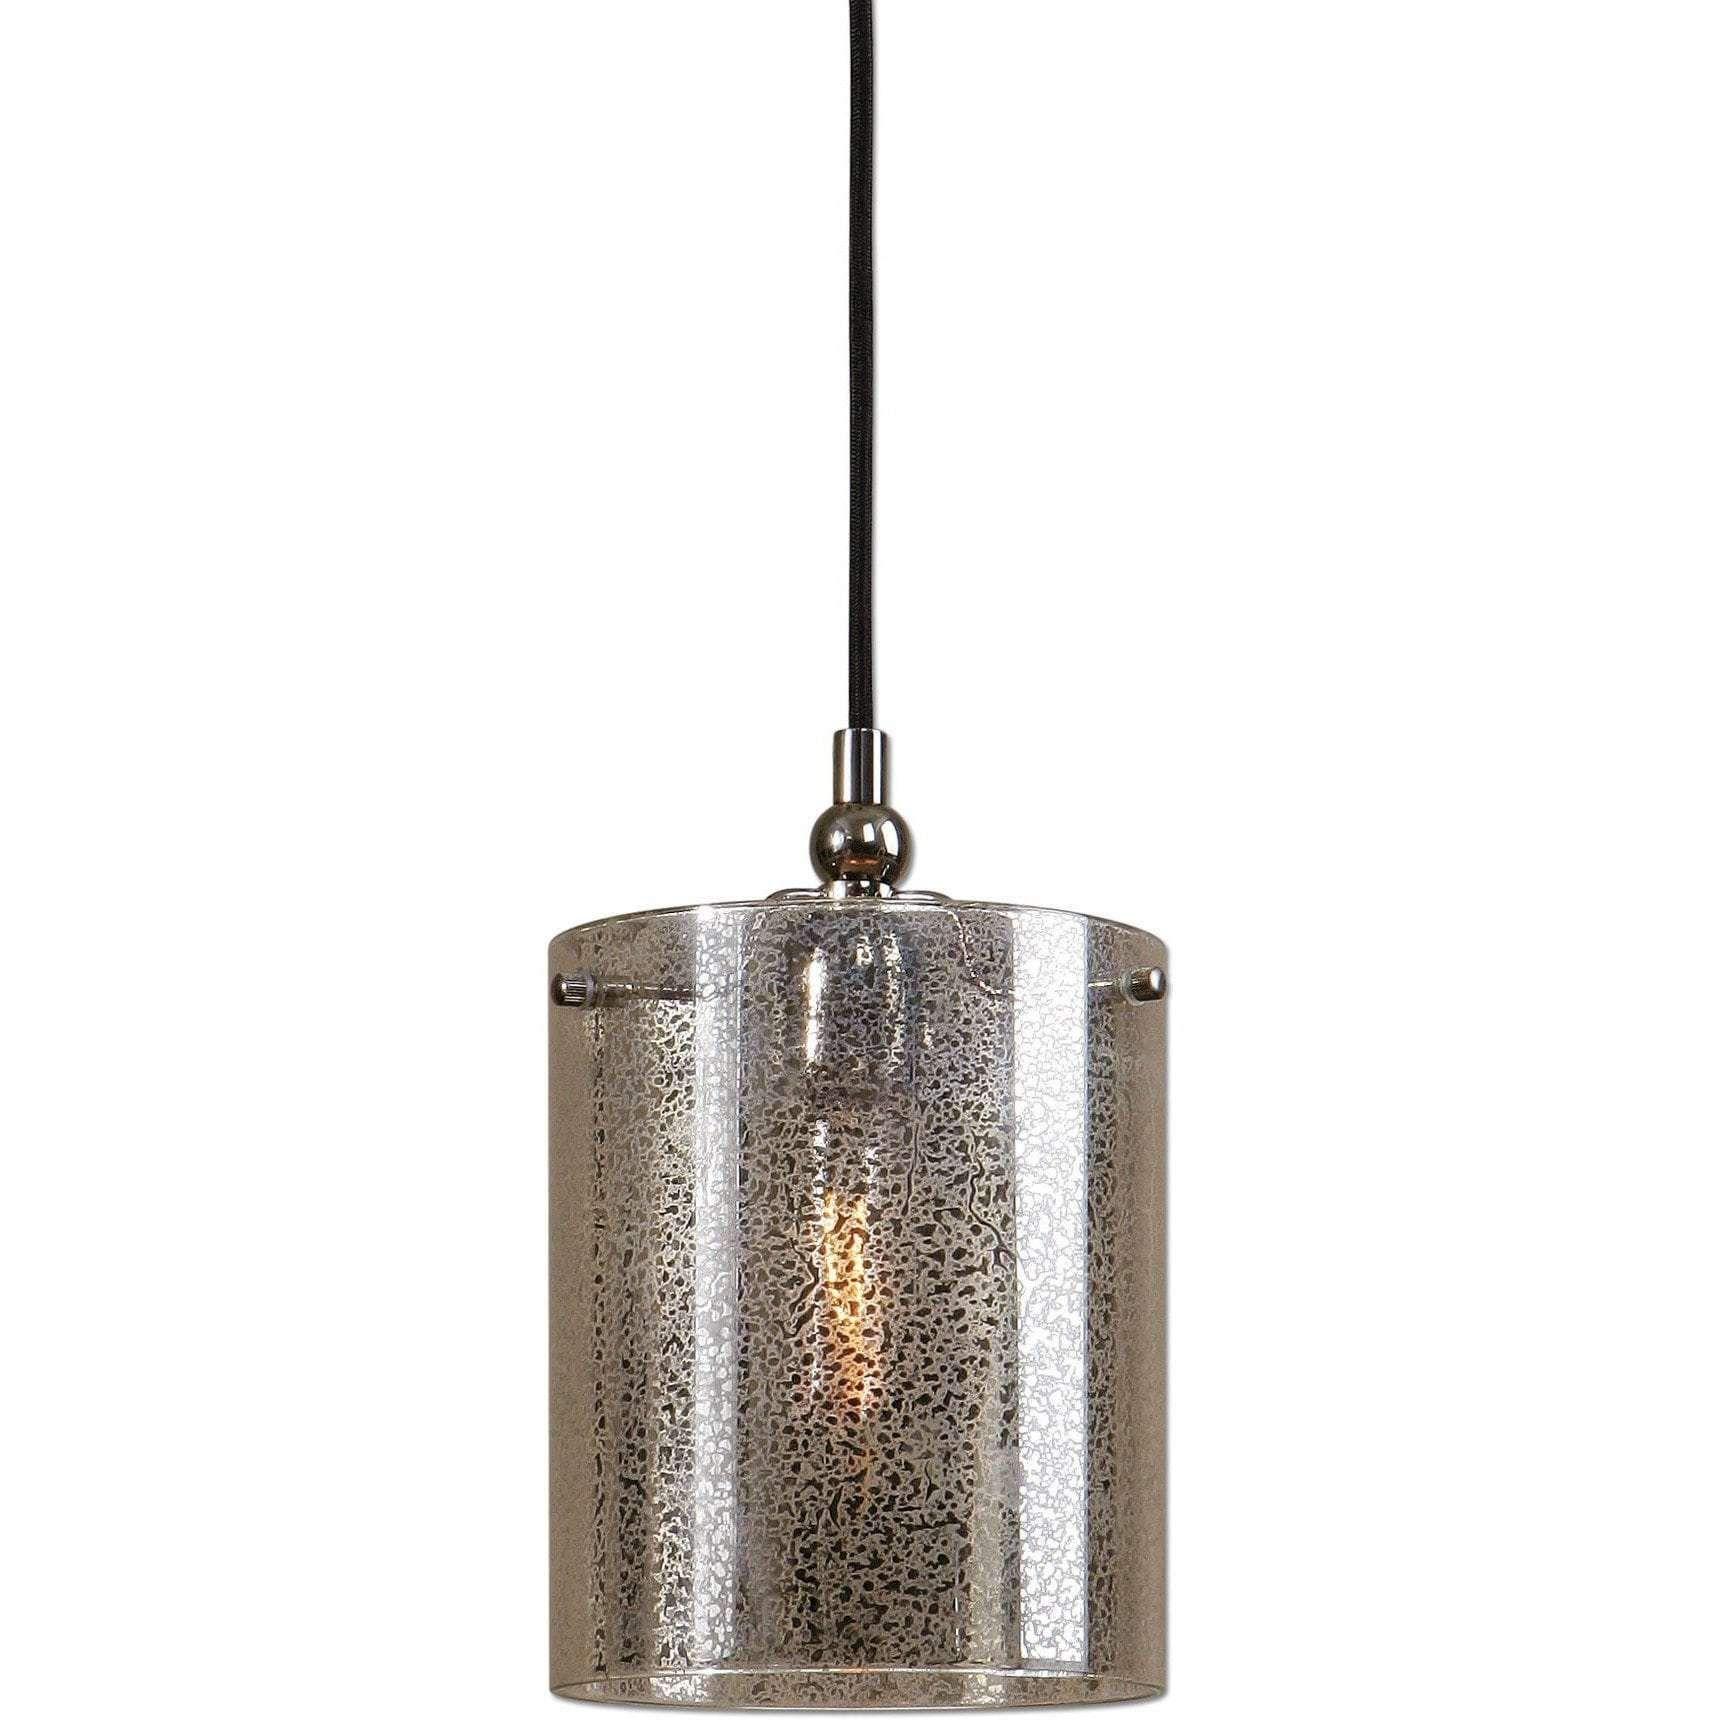 Mariano Mercury Glass Mini Pendantdefault Title In 2021 Mercury Glass Pendant Light Mini Pendant Lights Contemporary Pendant Lights